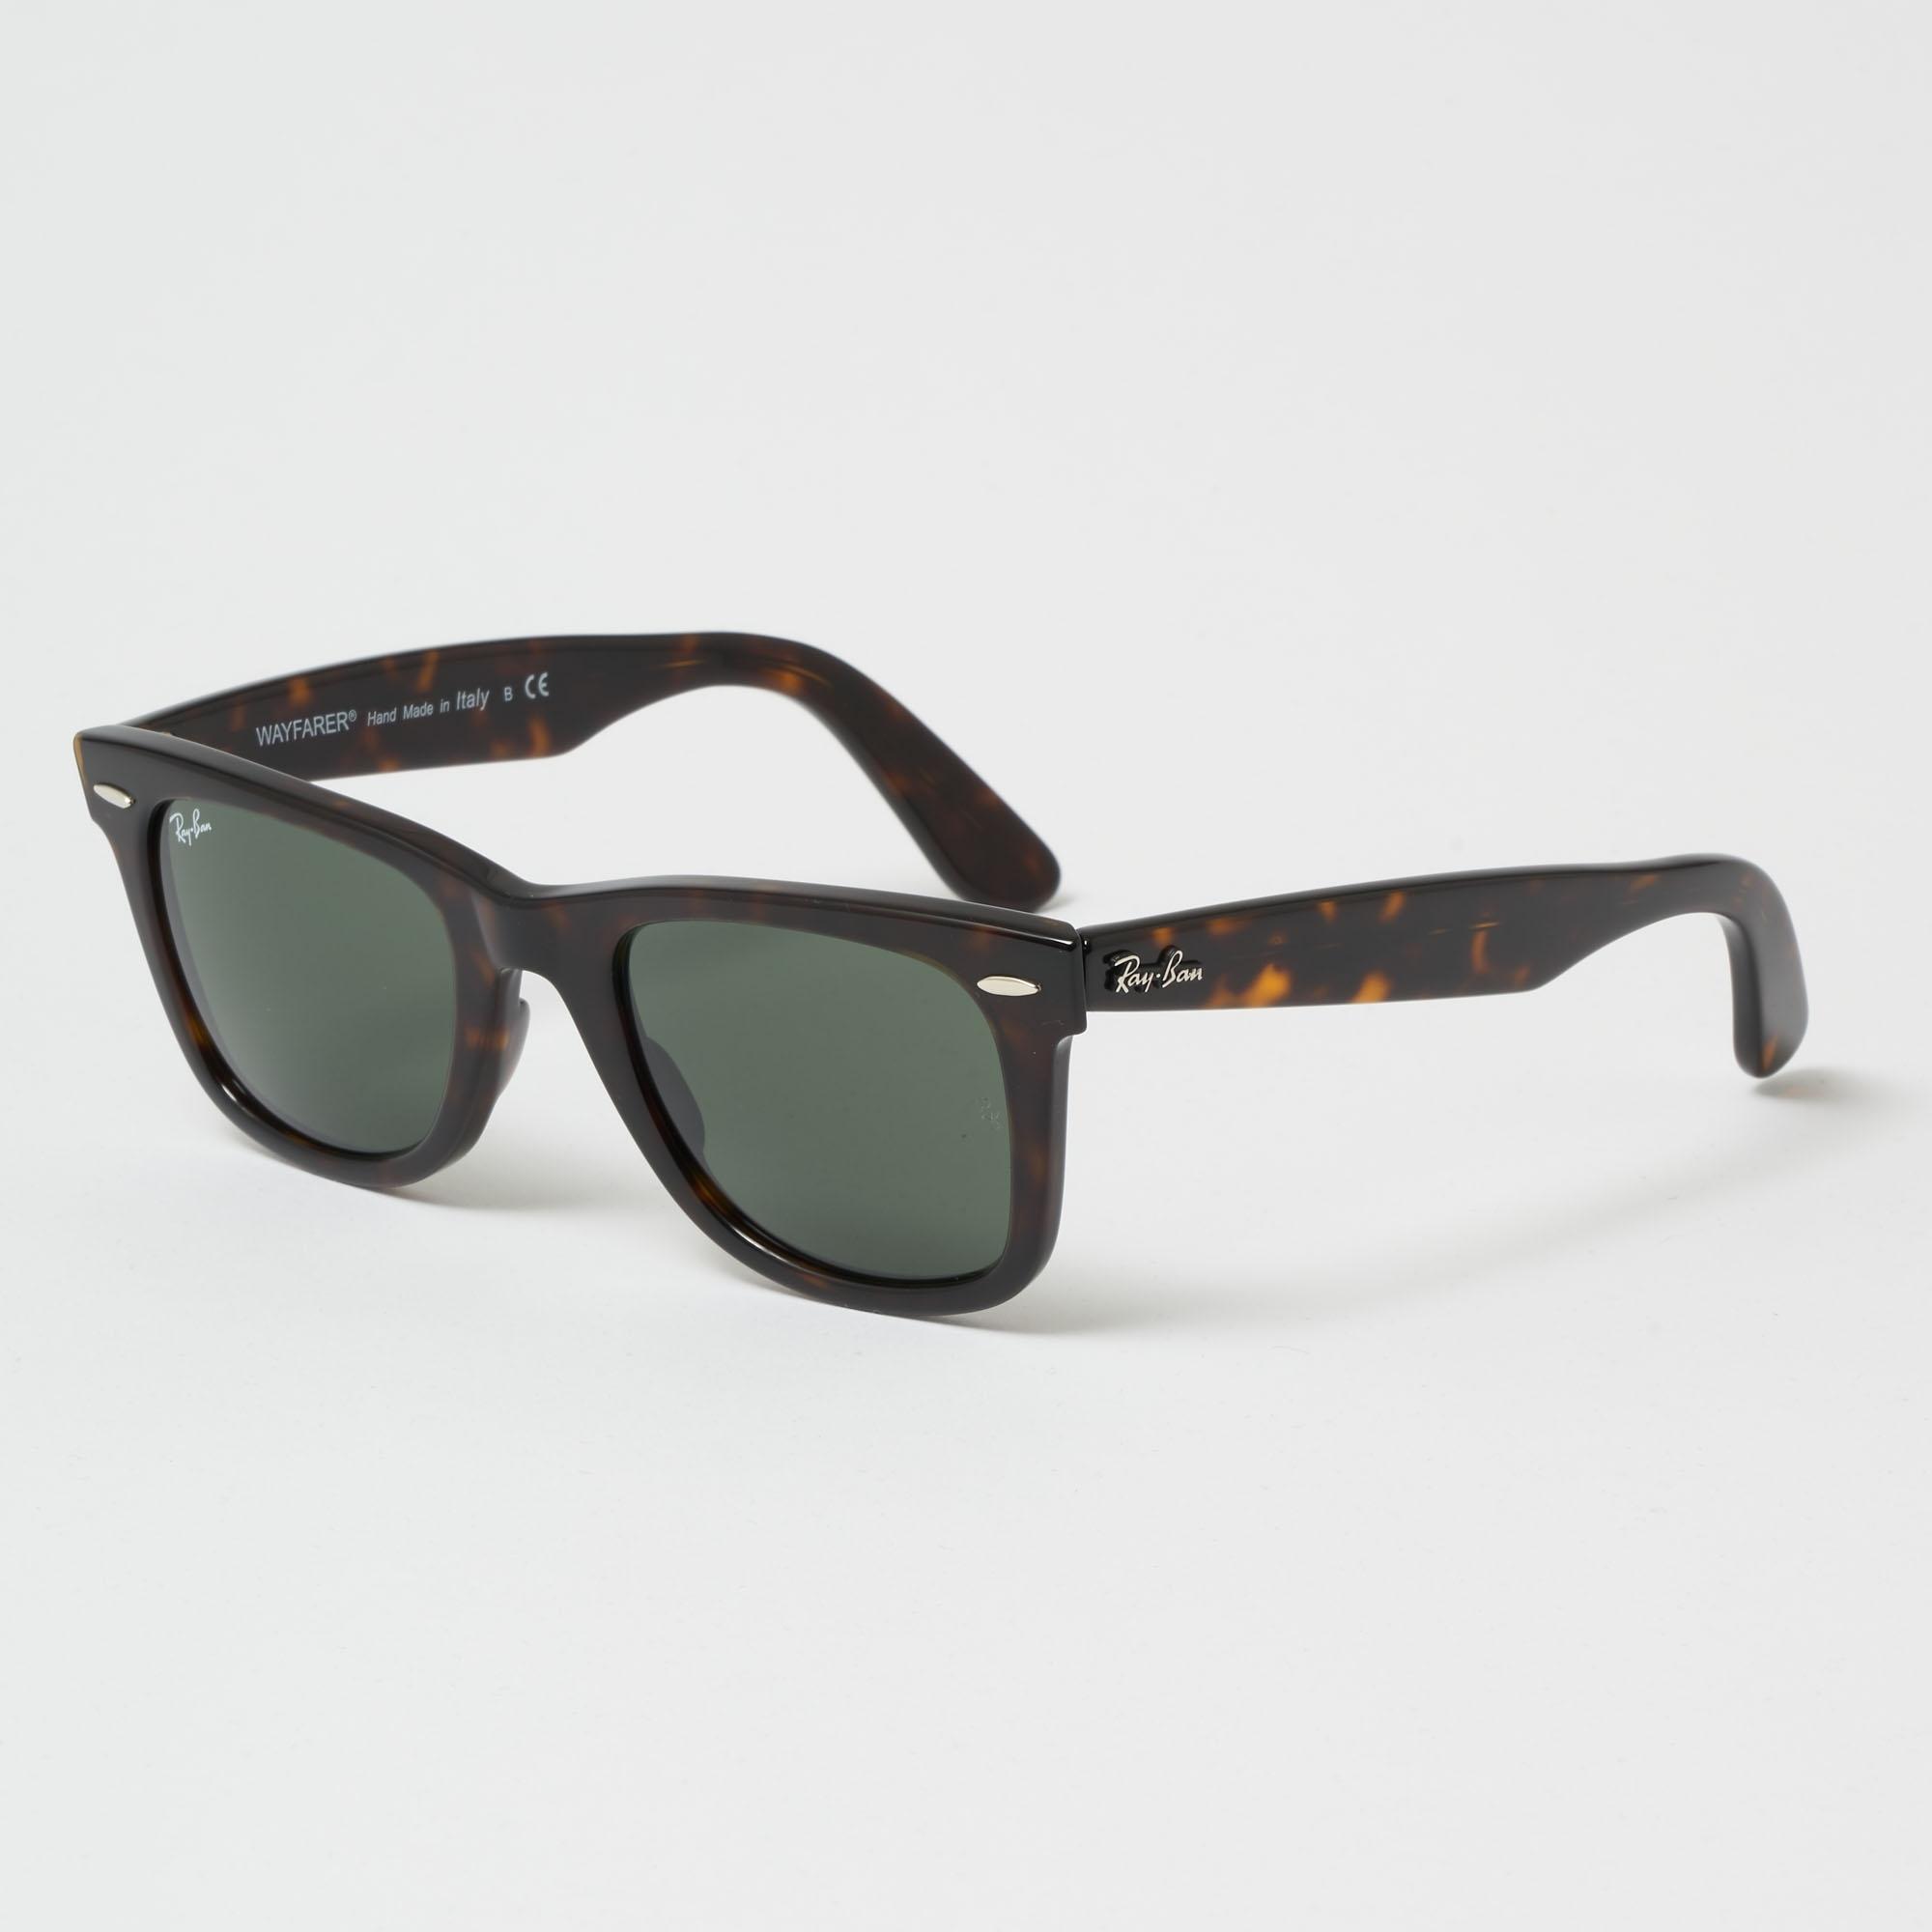 f85d23cbf Tortoise Original Wayfarer Classic Sunglasses - Green Classic G-15 Lenses